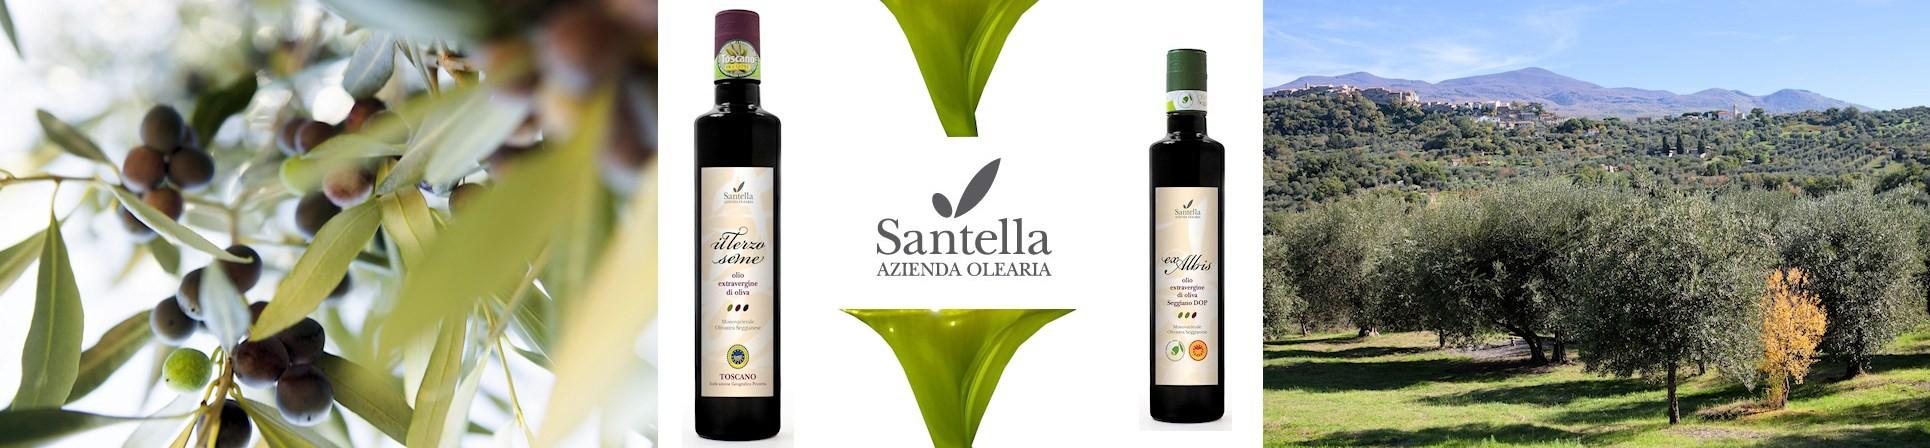 Olio Extravergine d'oliva Seggiano DOP - Toscano IGP - vendita online